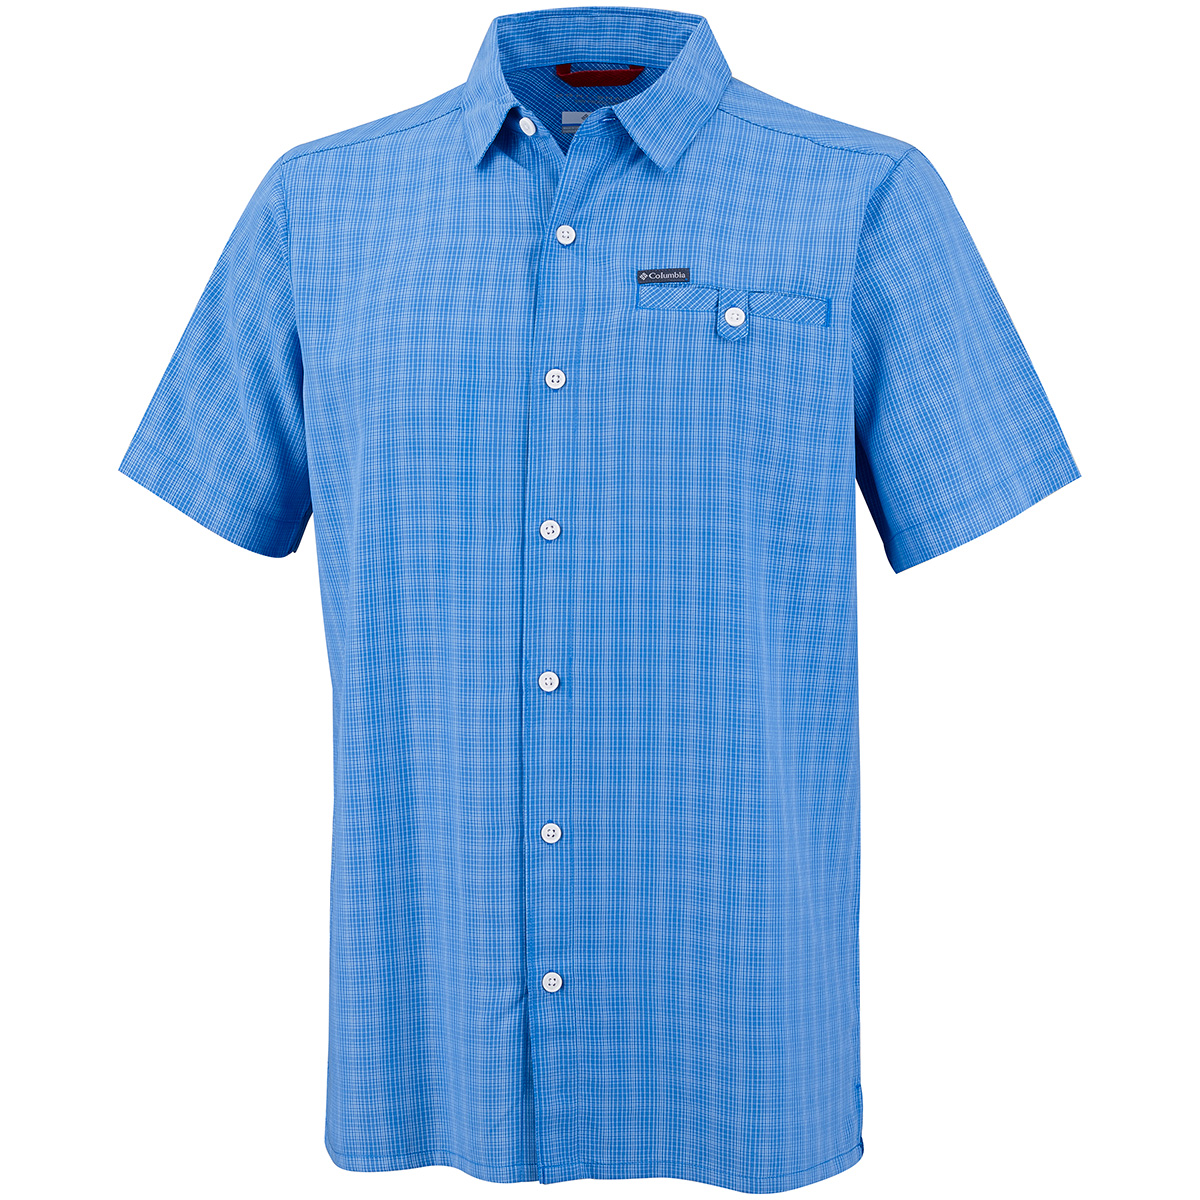 Columbia declination trail ii short sleeve shirt 2015 for Columbia cotton fishing shirt